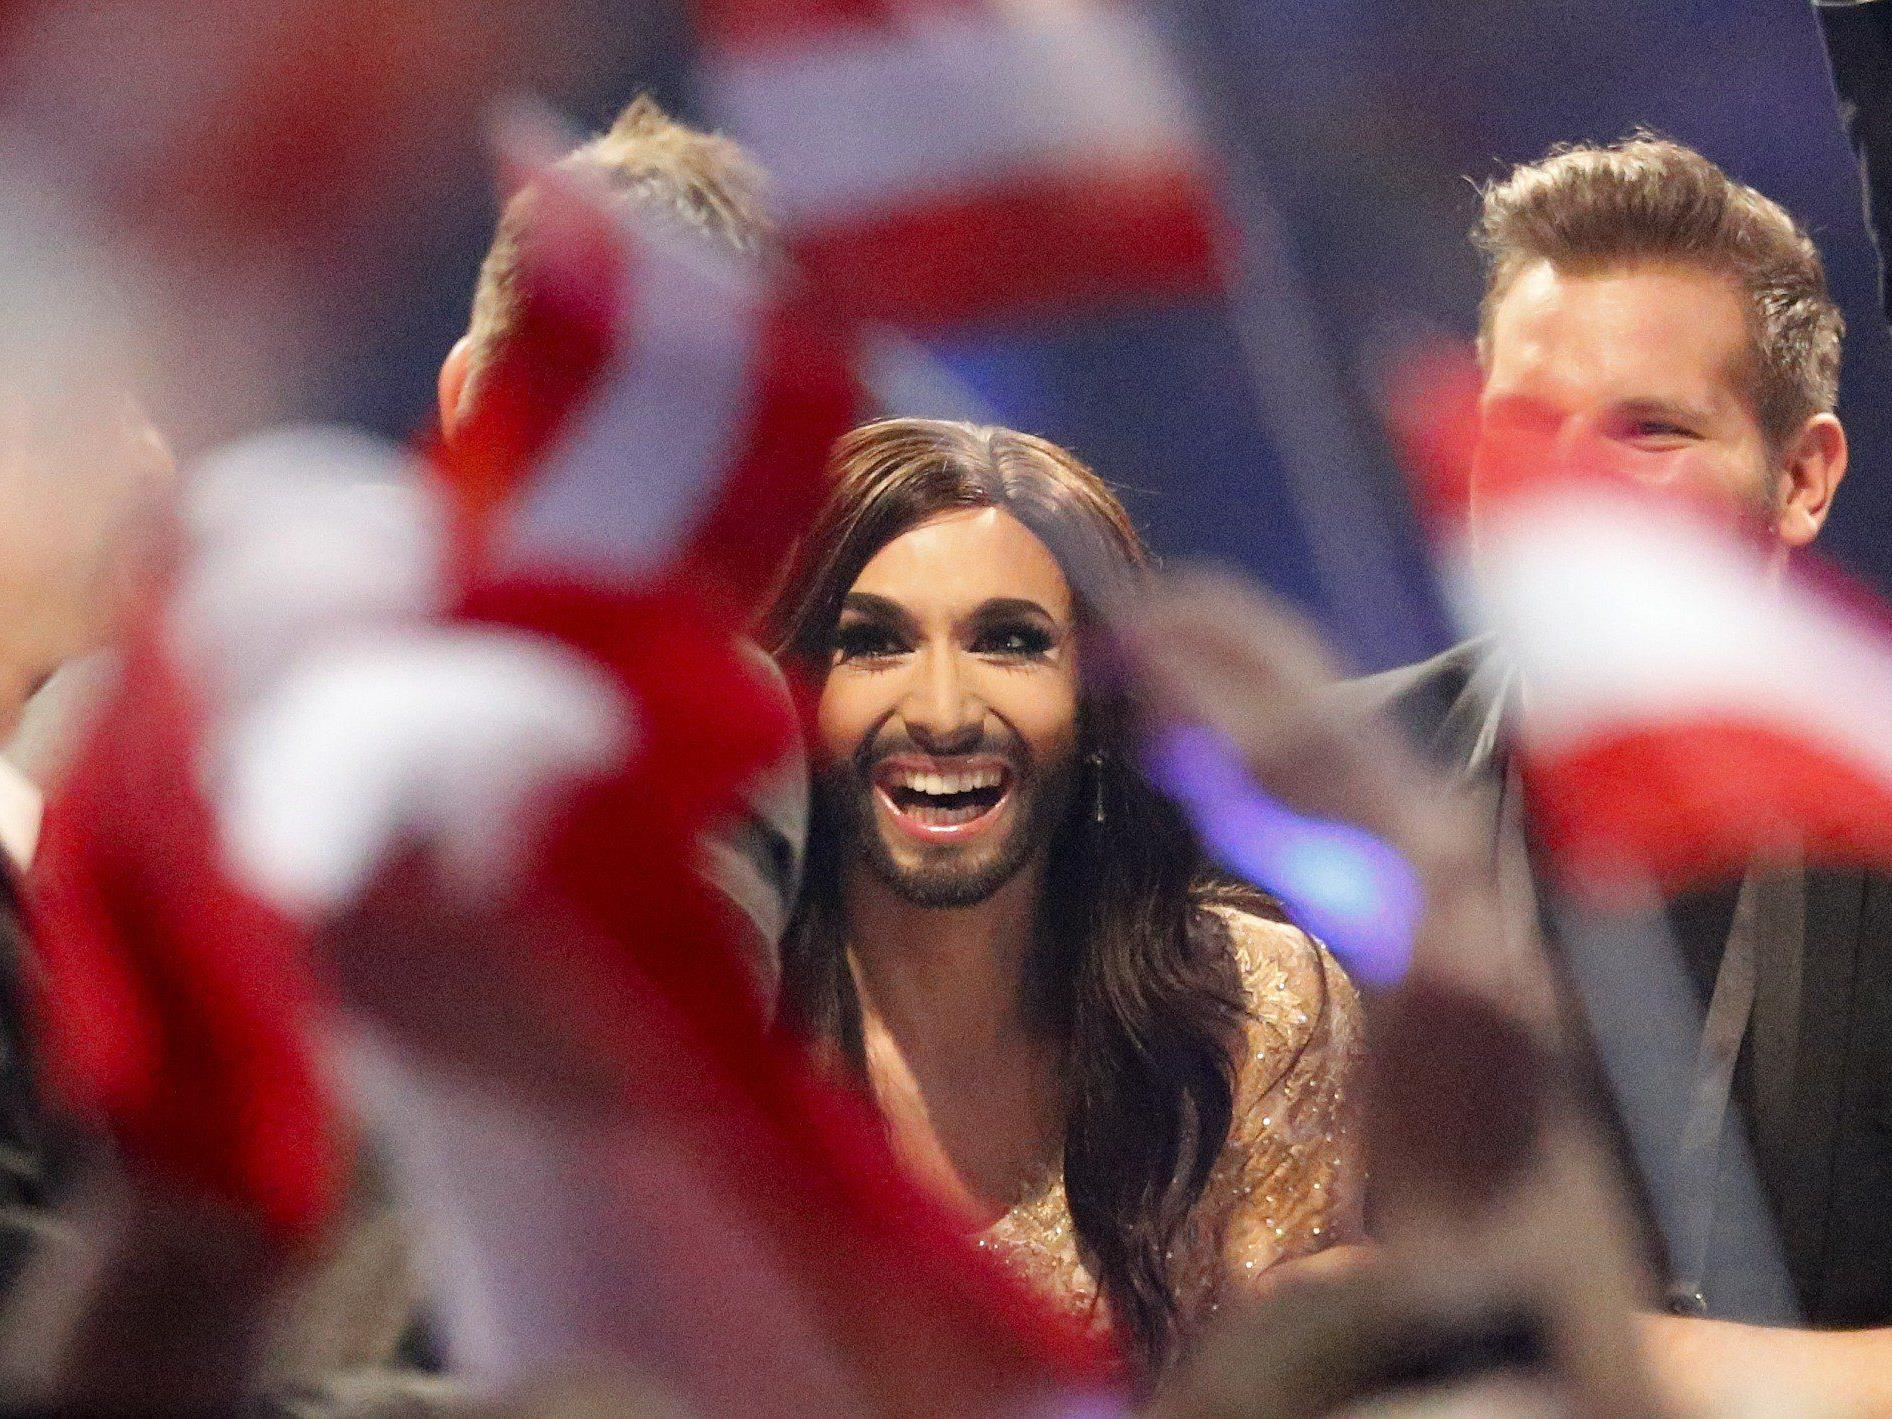 Bärtige Dragqueen triumphiert in Kopenhagen über die Konkurrenz .